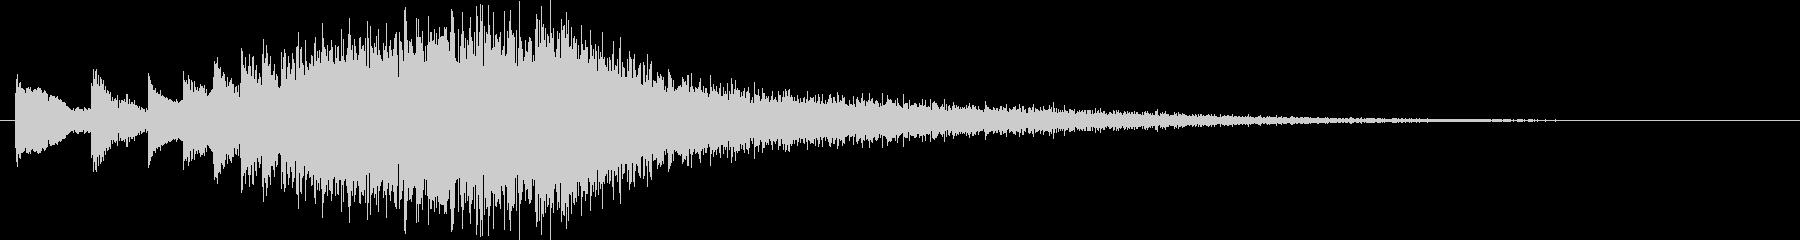 KANT 絶望のピアノフレーズ1の未再生の波形